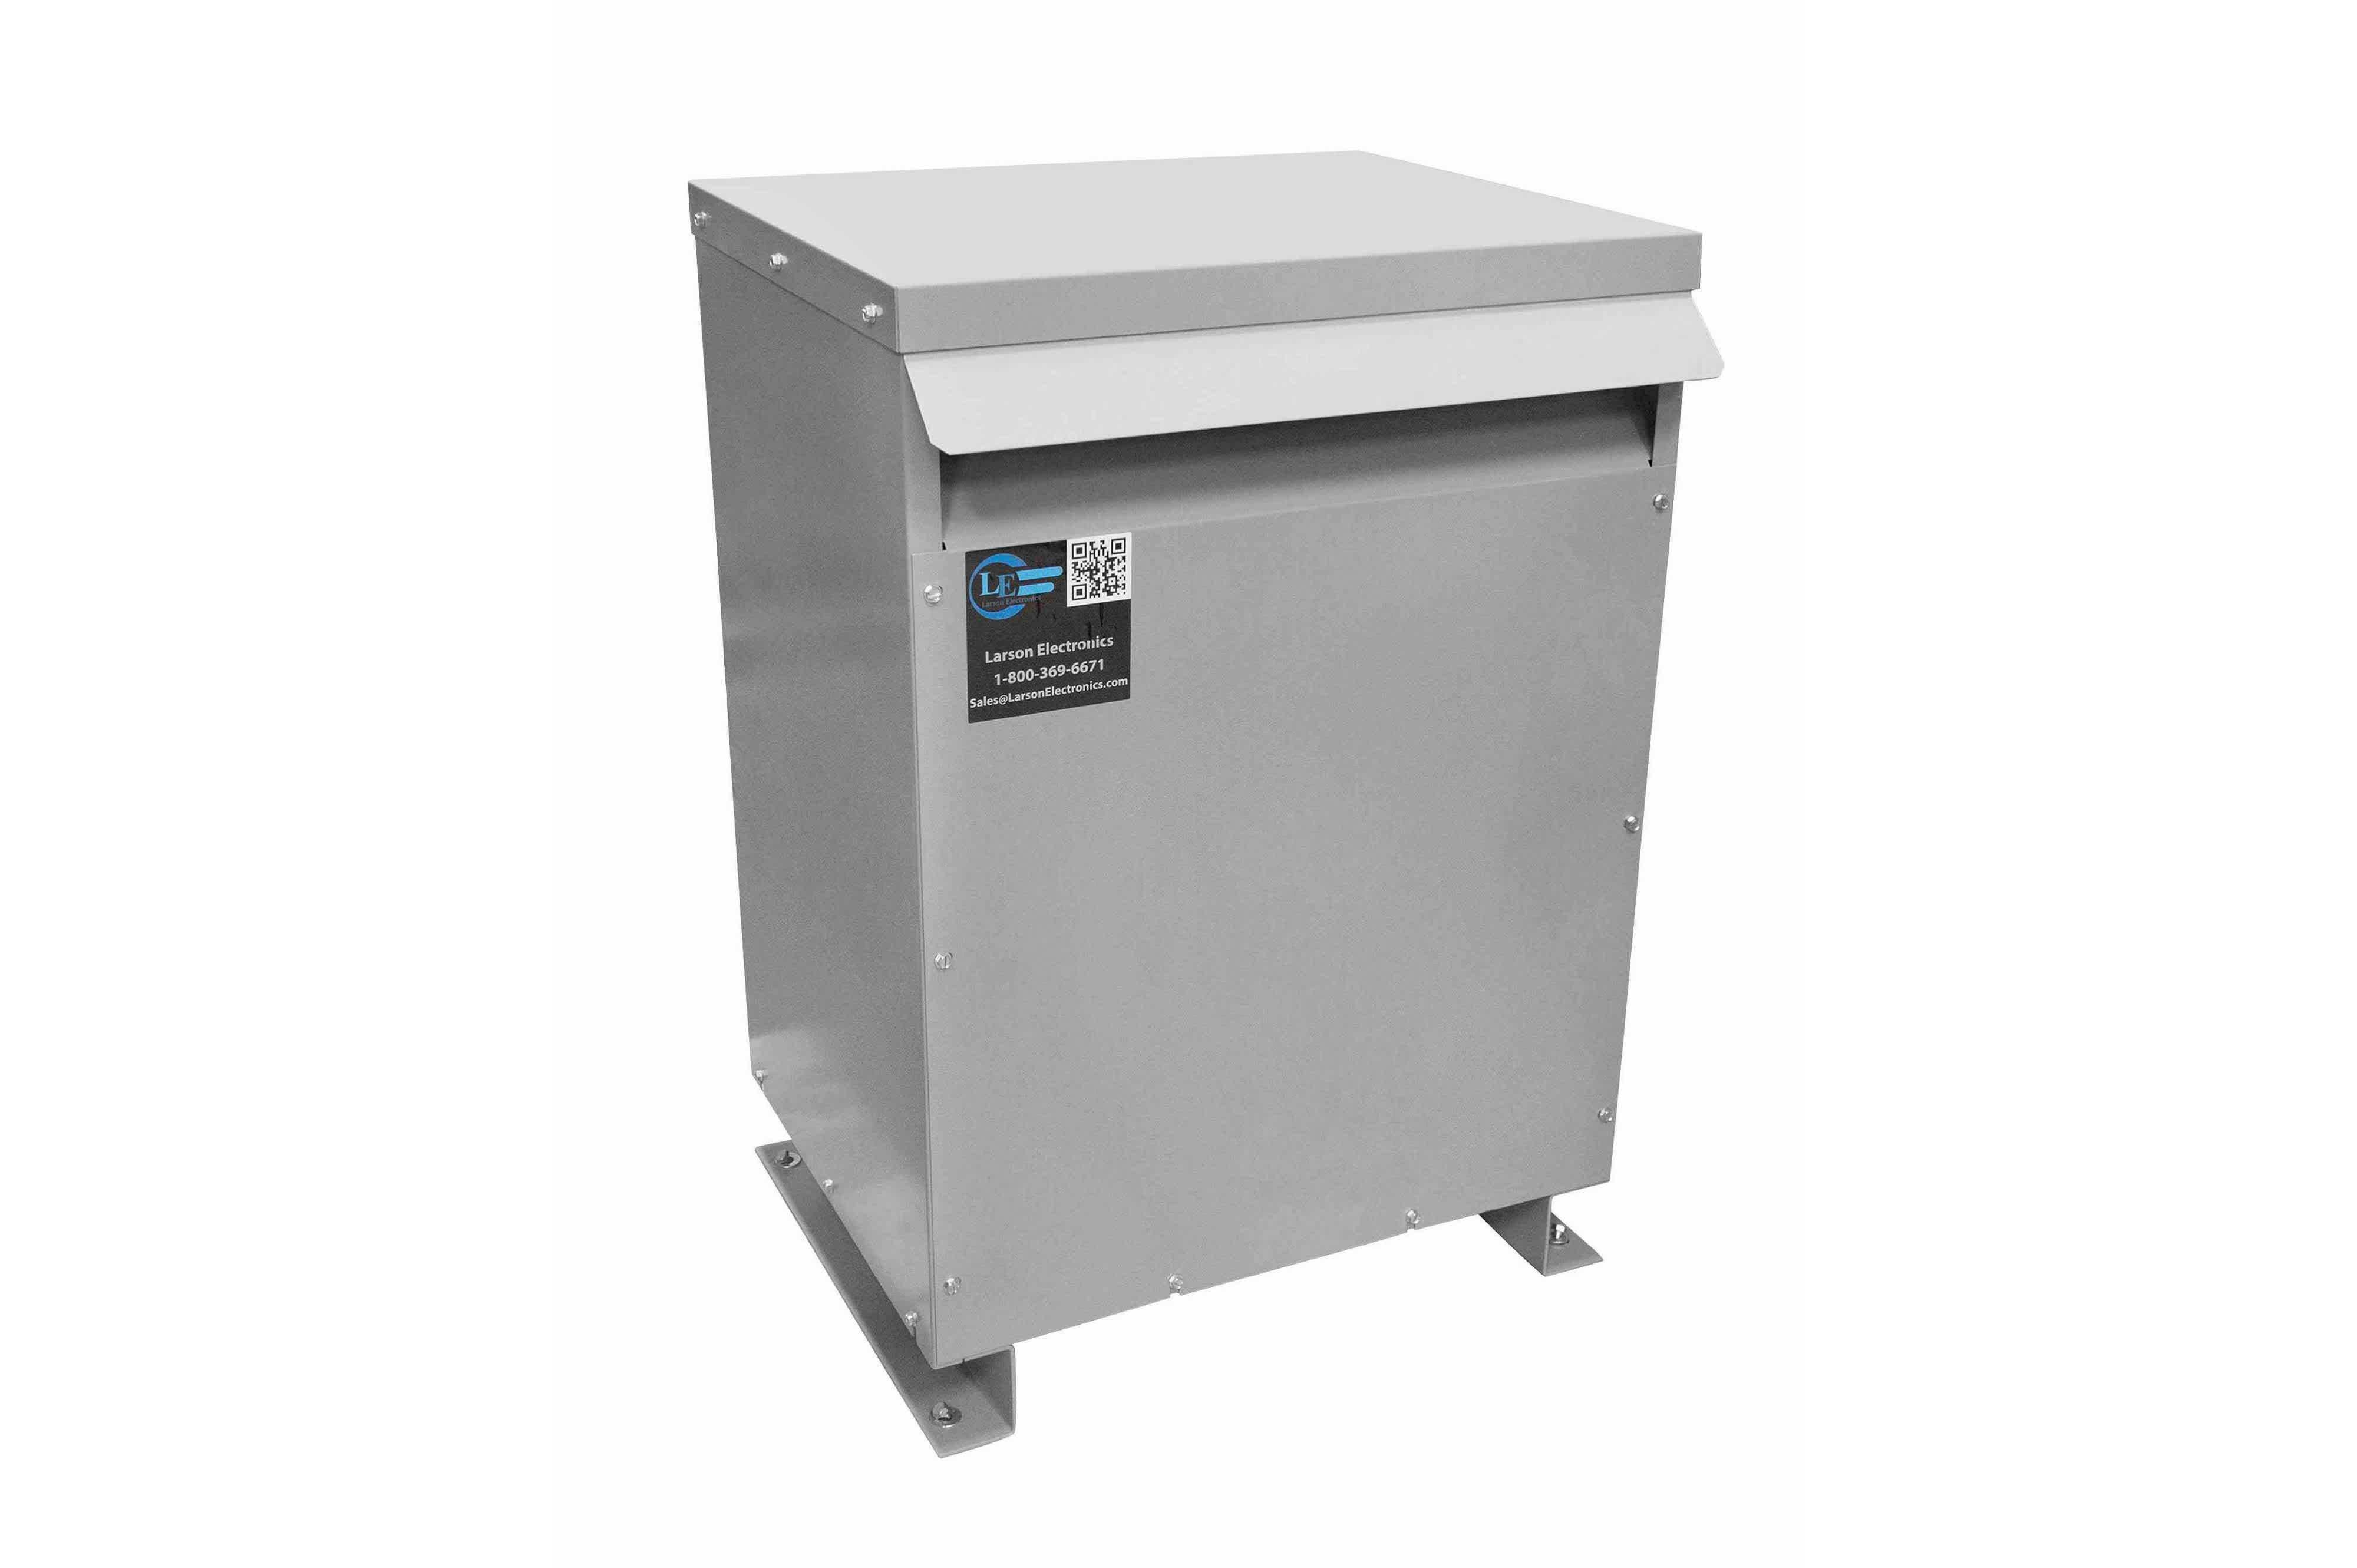 125 kVA 3PH Isolation Transformer, 480V Wye Primary, 415V Delta Secondary, N3R, Ventilated, 60 Hz